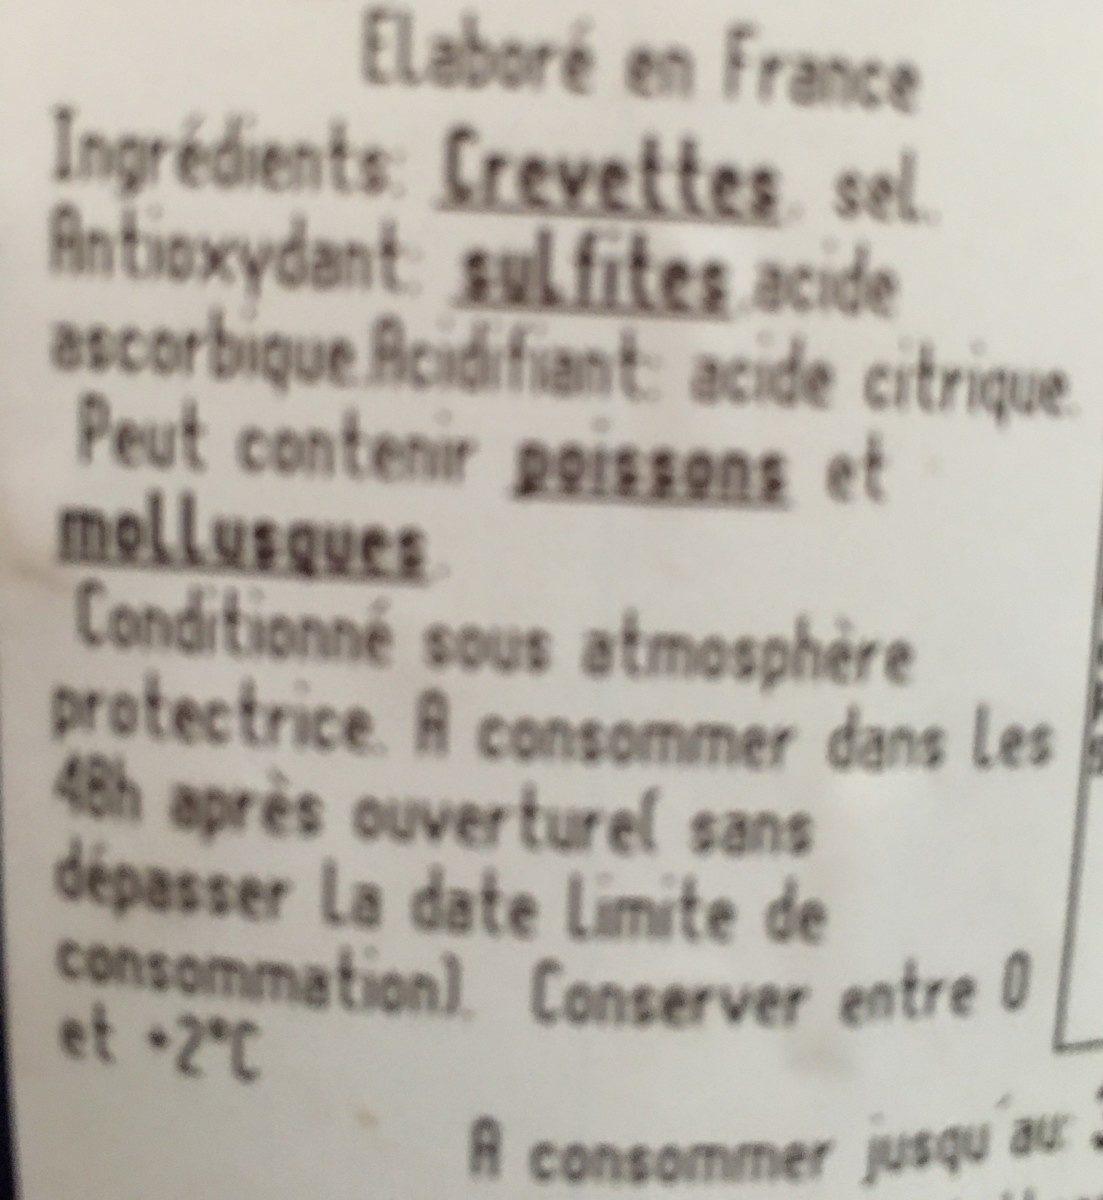 Crevettes entieres cuites sauvages - Ingredients - fr